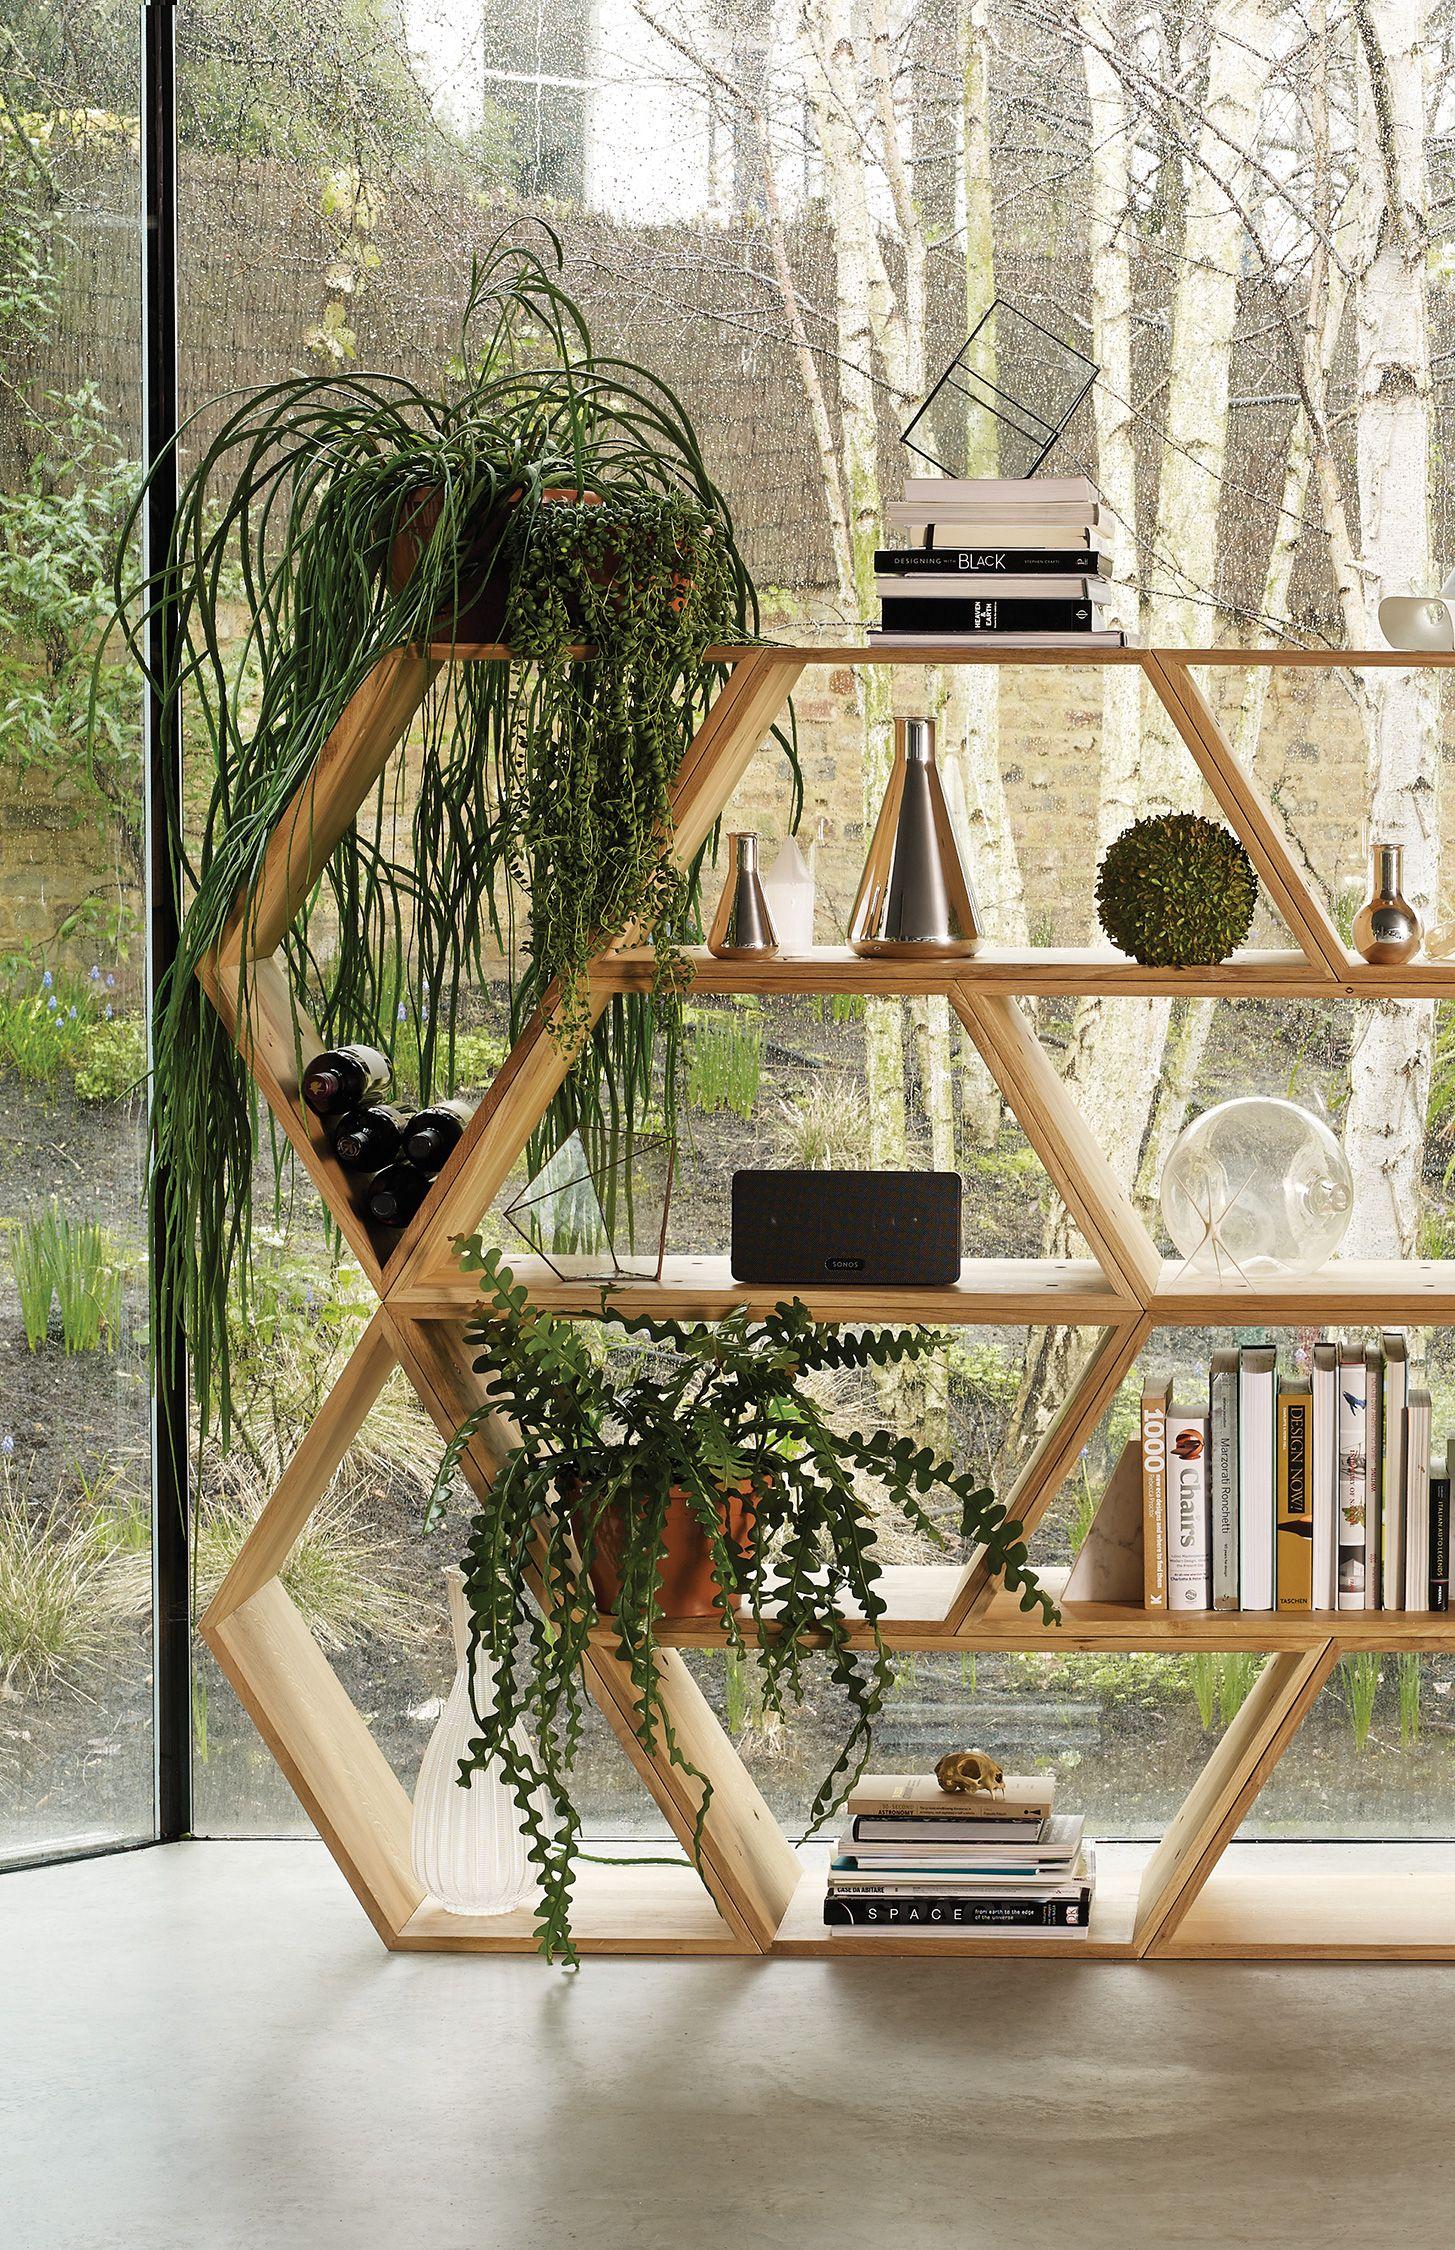 Tetra Modular Shelving System Modular Shelving Shelves And - Design your own furniture with tetran eco friendly modular cubes